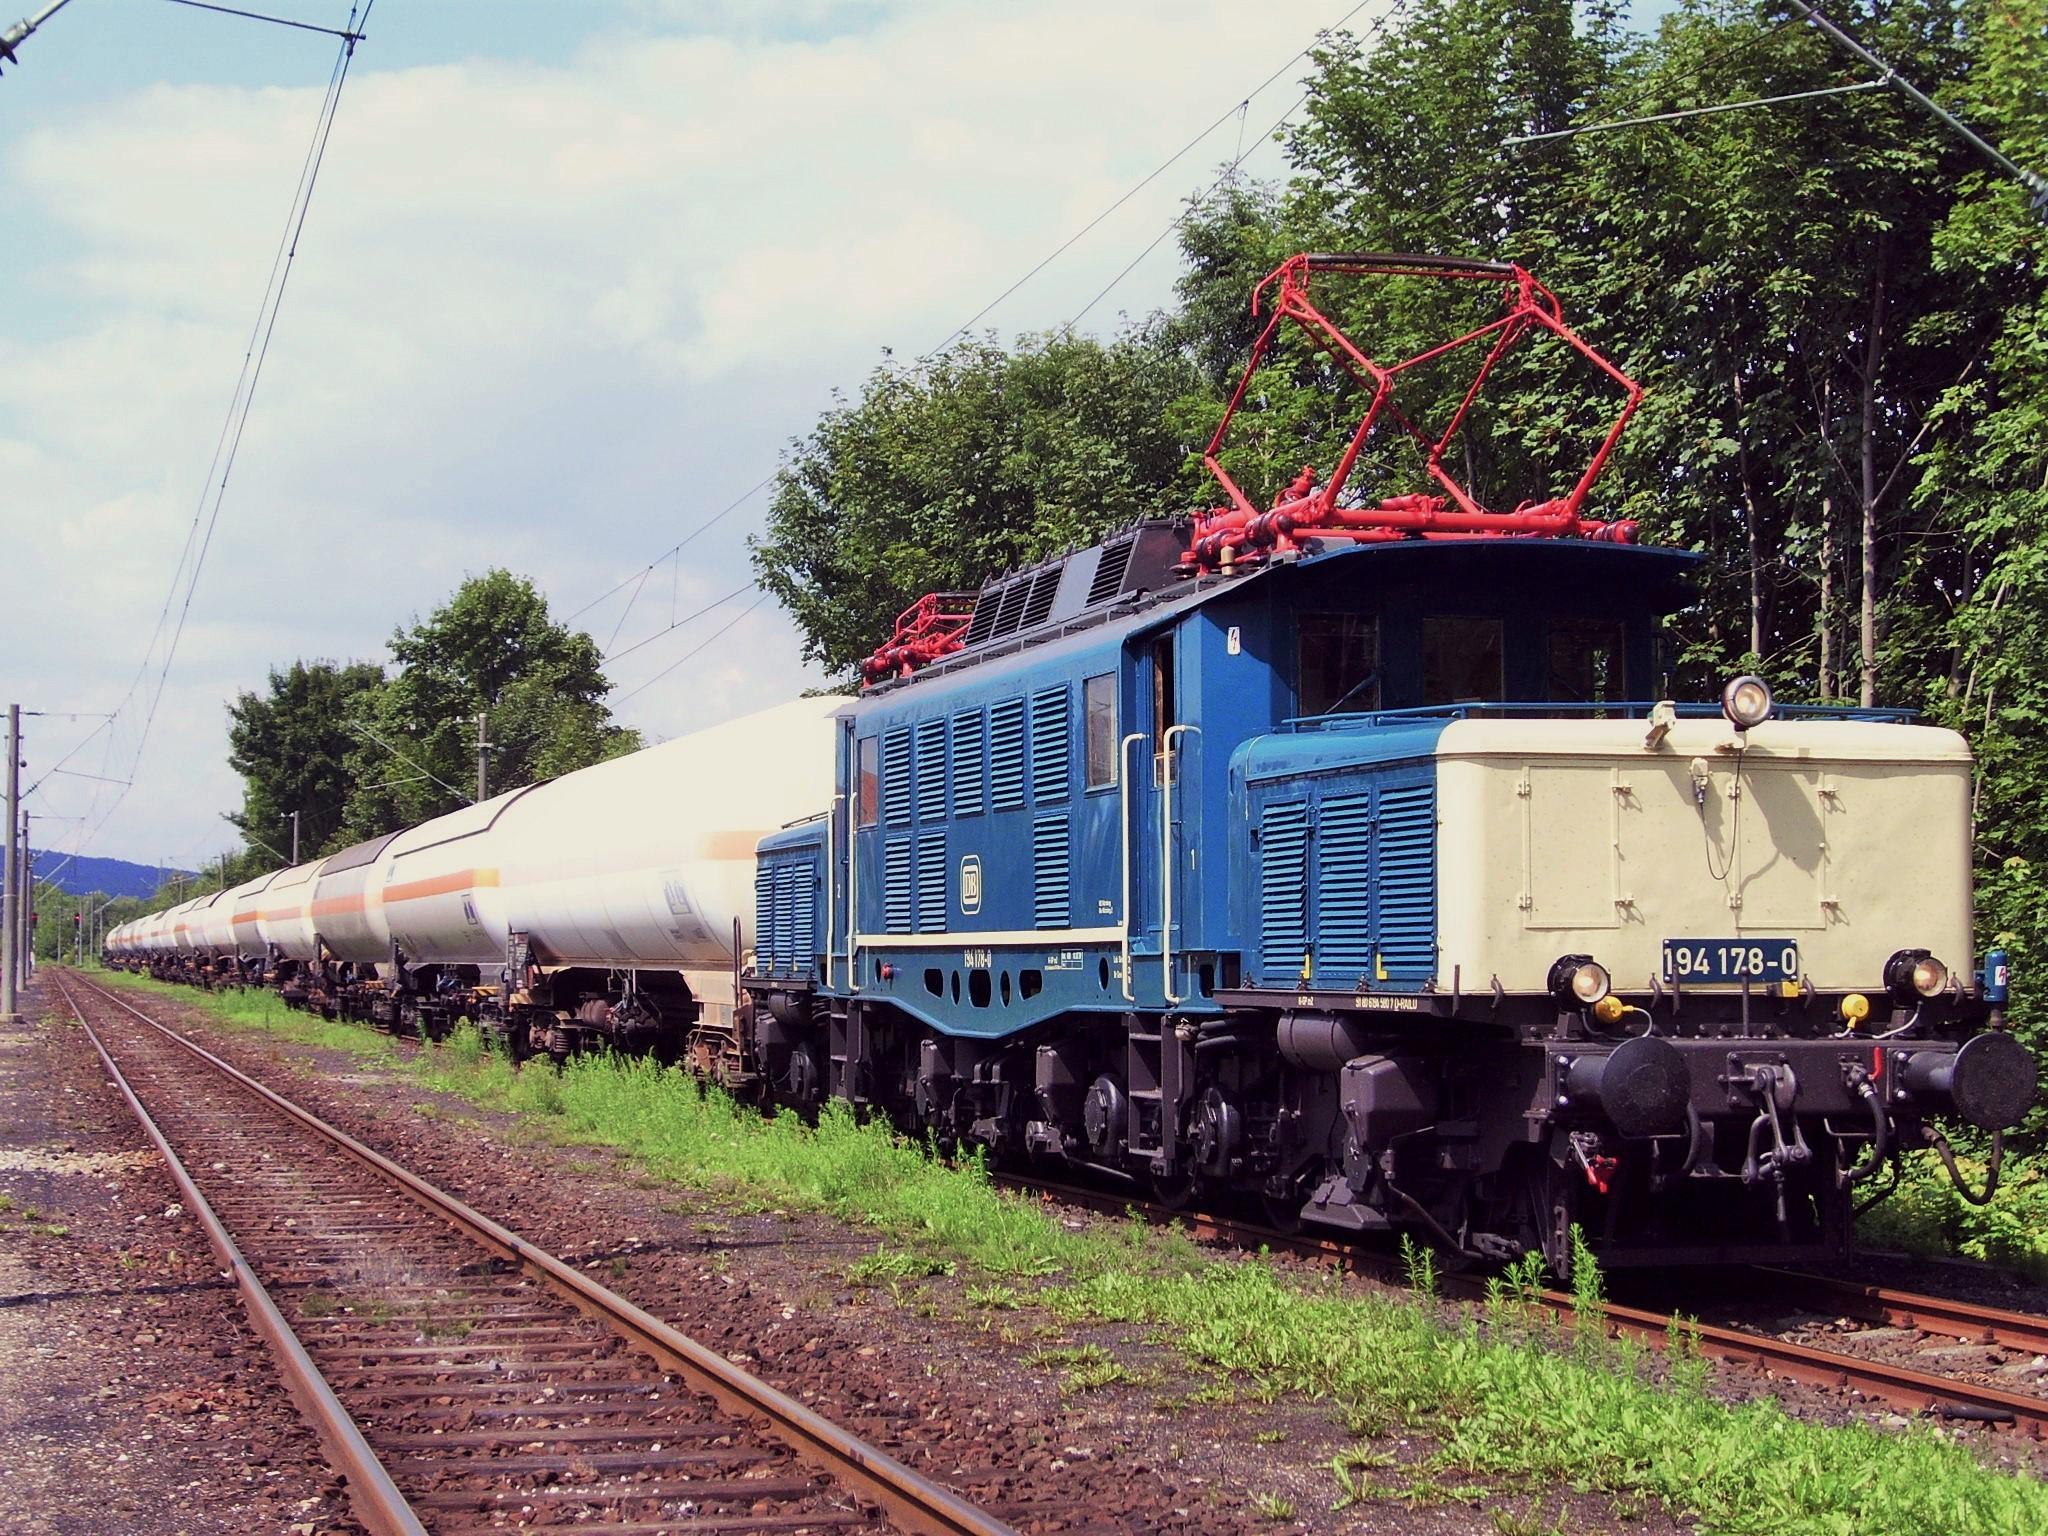 Gaskesselzug mit 194 178-0 in Saal / Donau